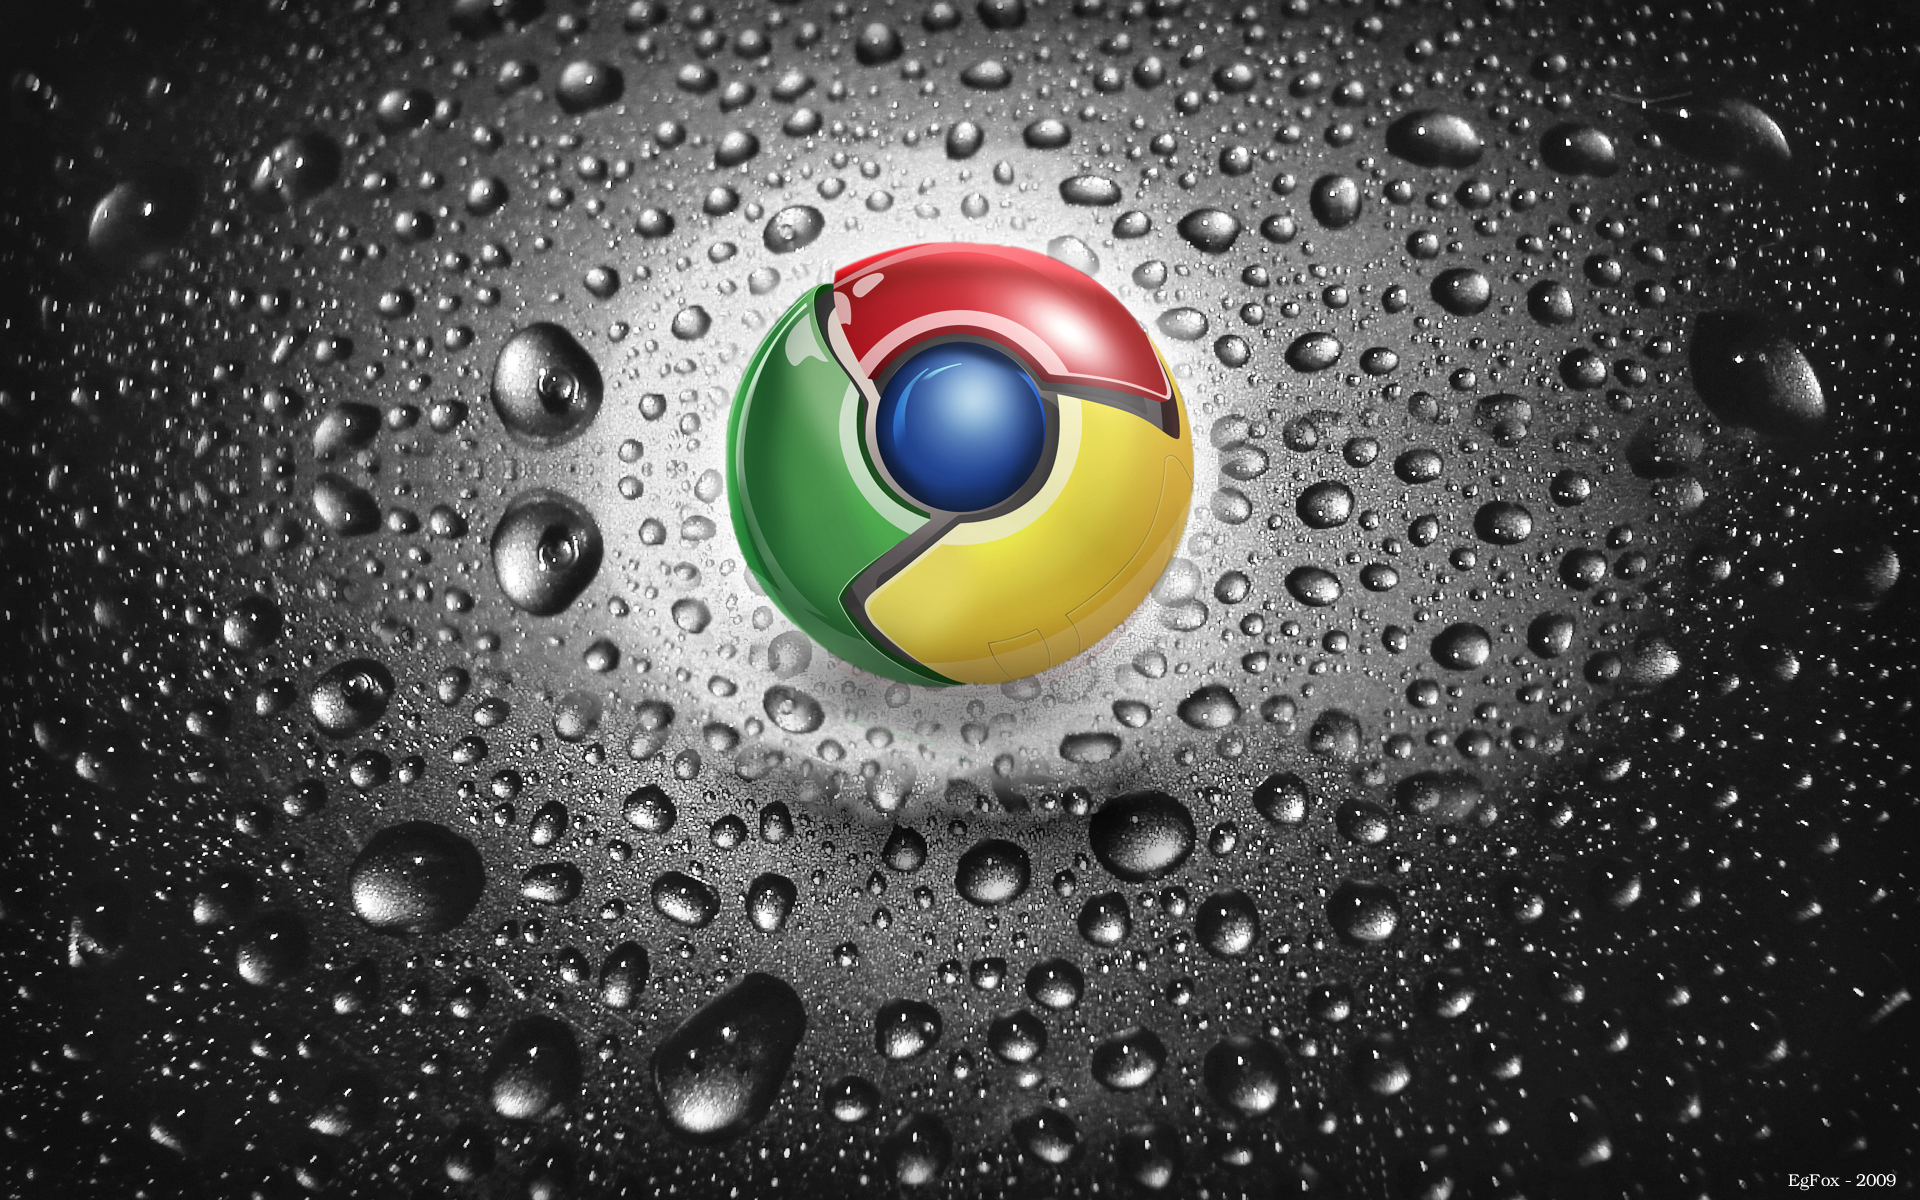 Google Backgrounds Images - WallpaperSafari